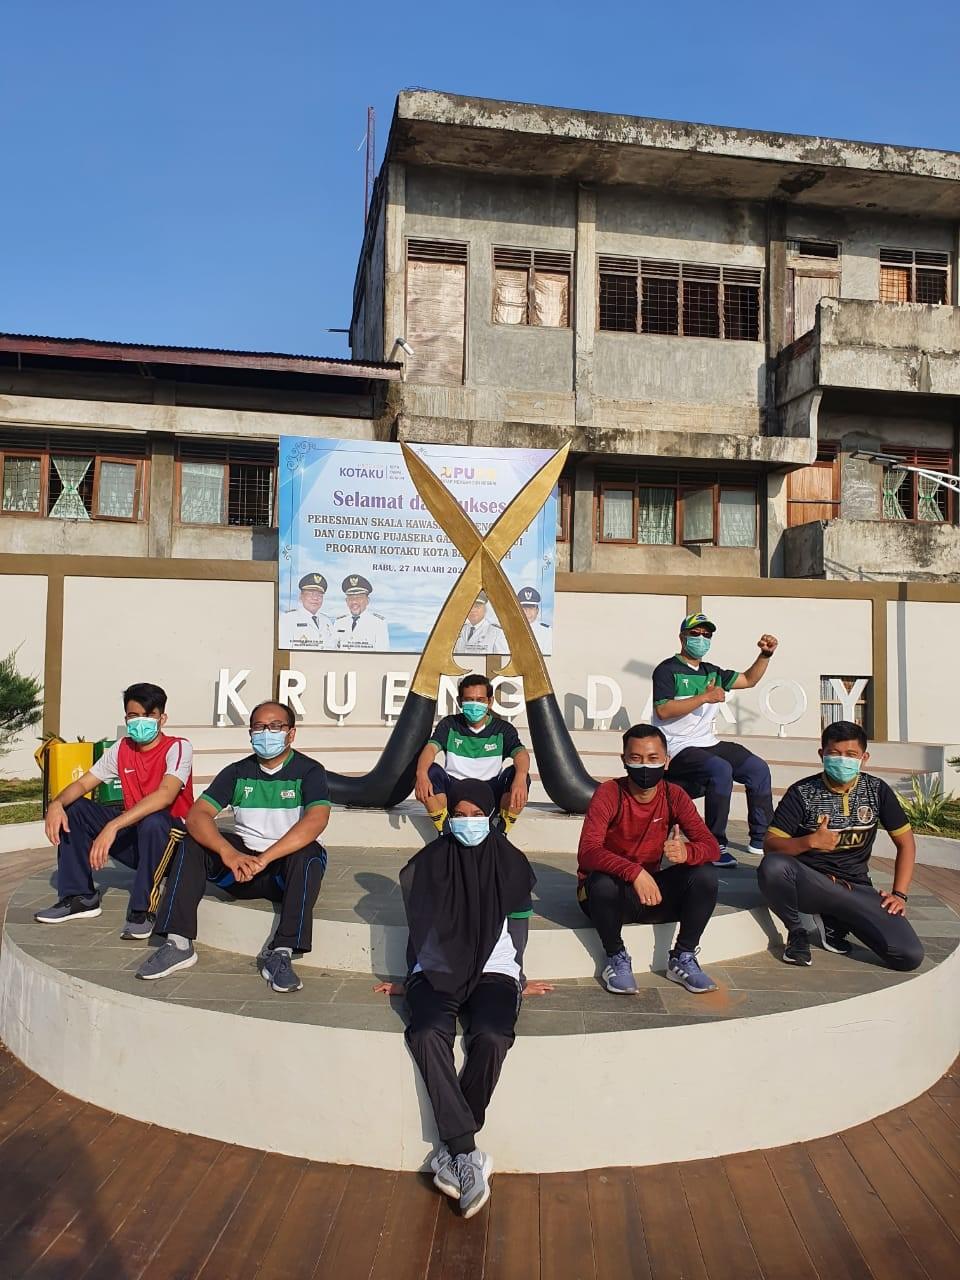 Taman Krueng Daroy Contoh Sukses Pengelolaan Bantaran Sungai Di Banda Aceh